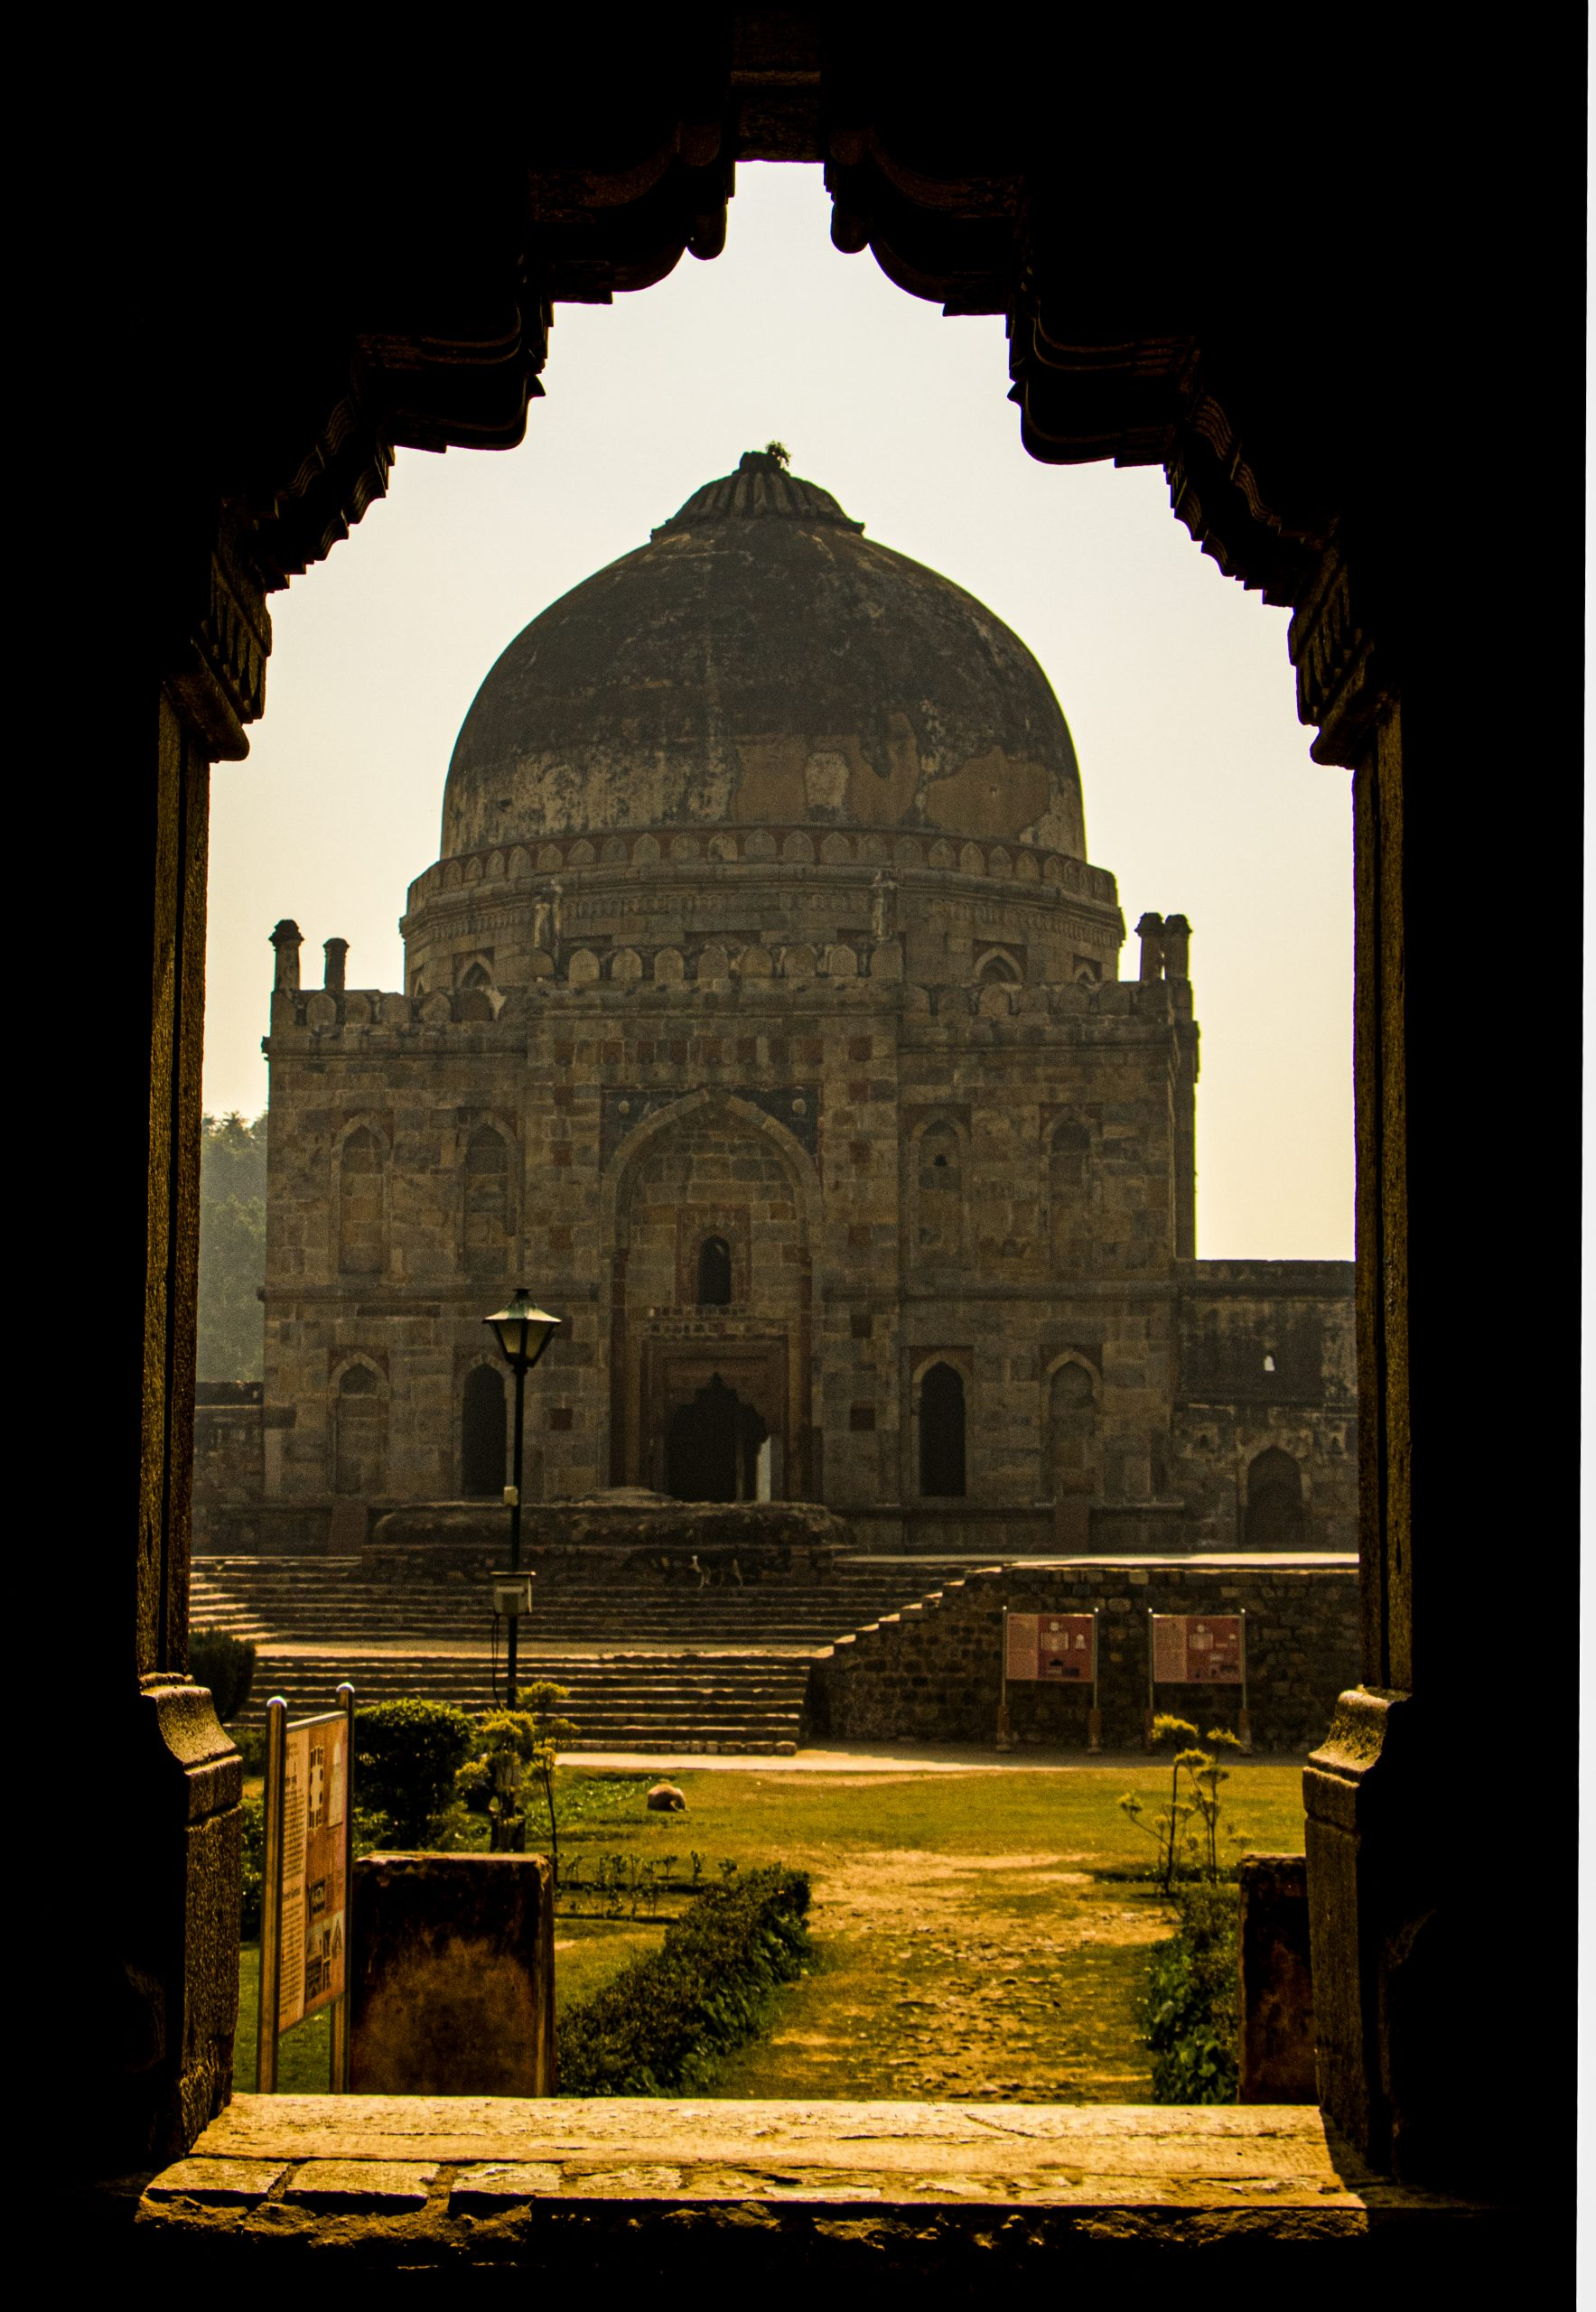 Marvel of classic architecture